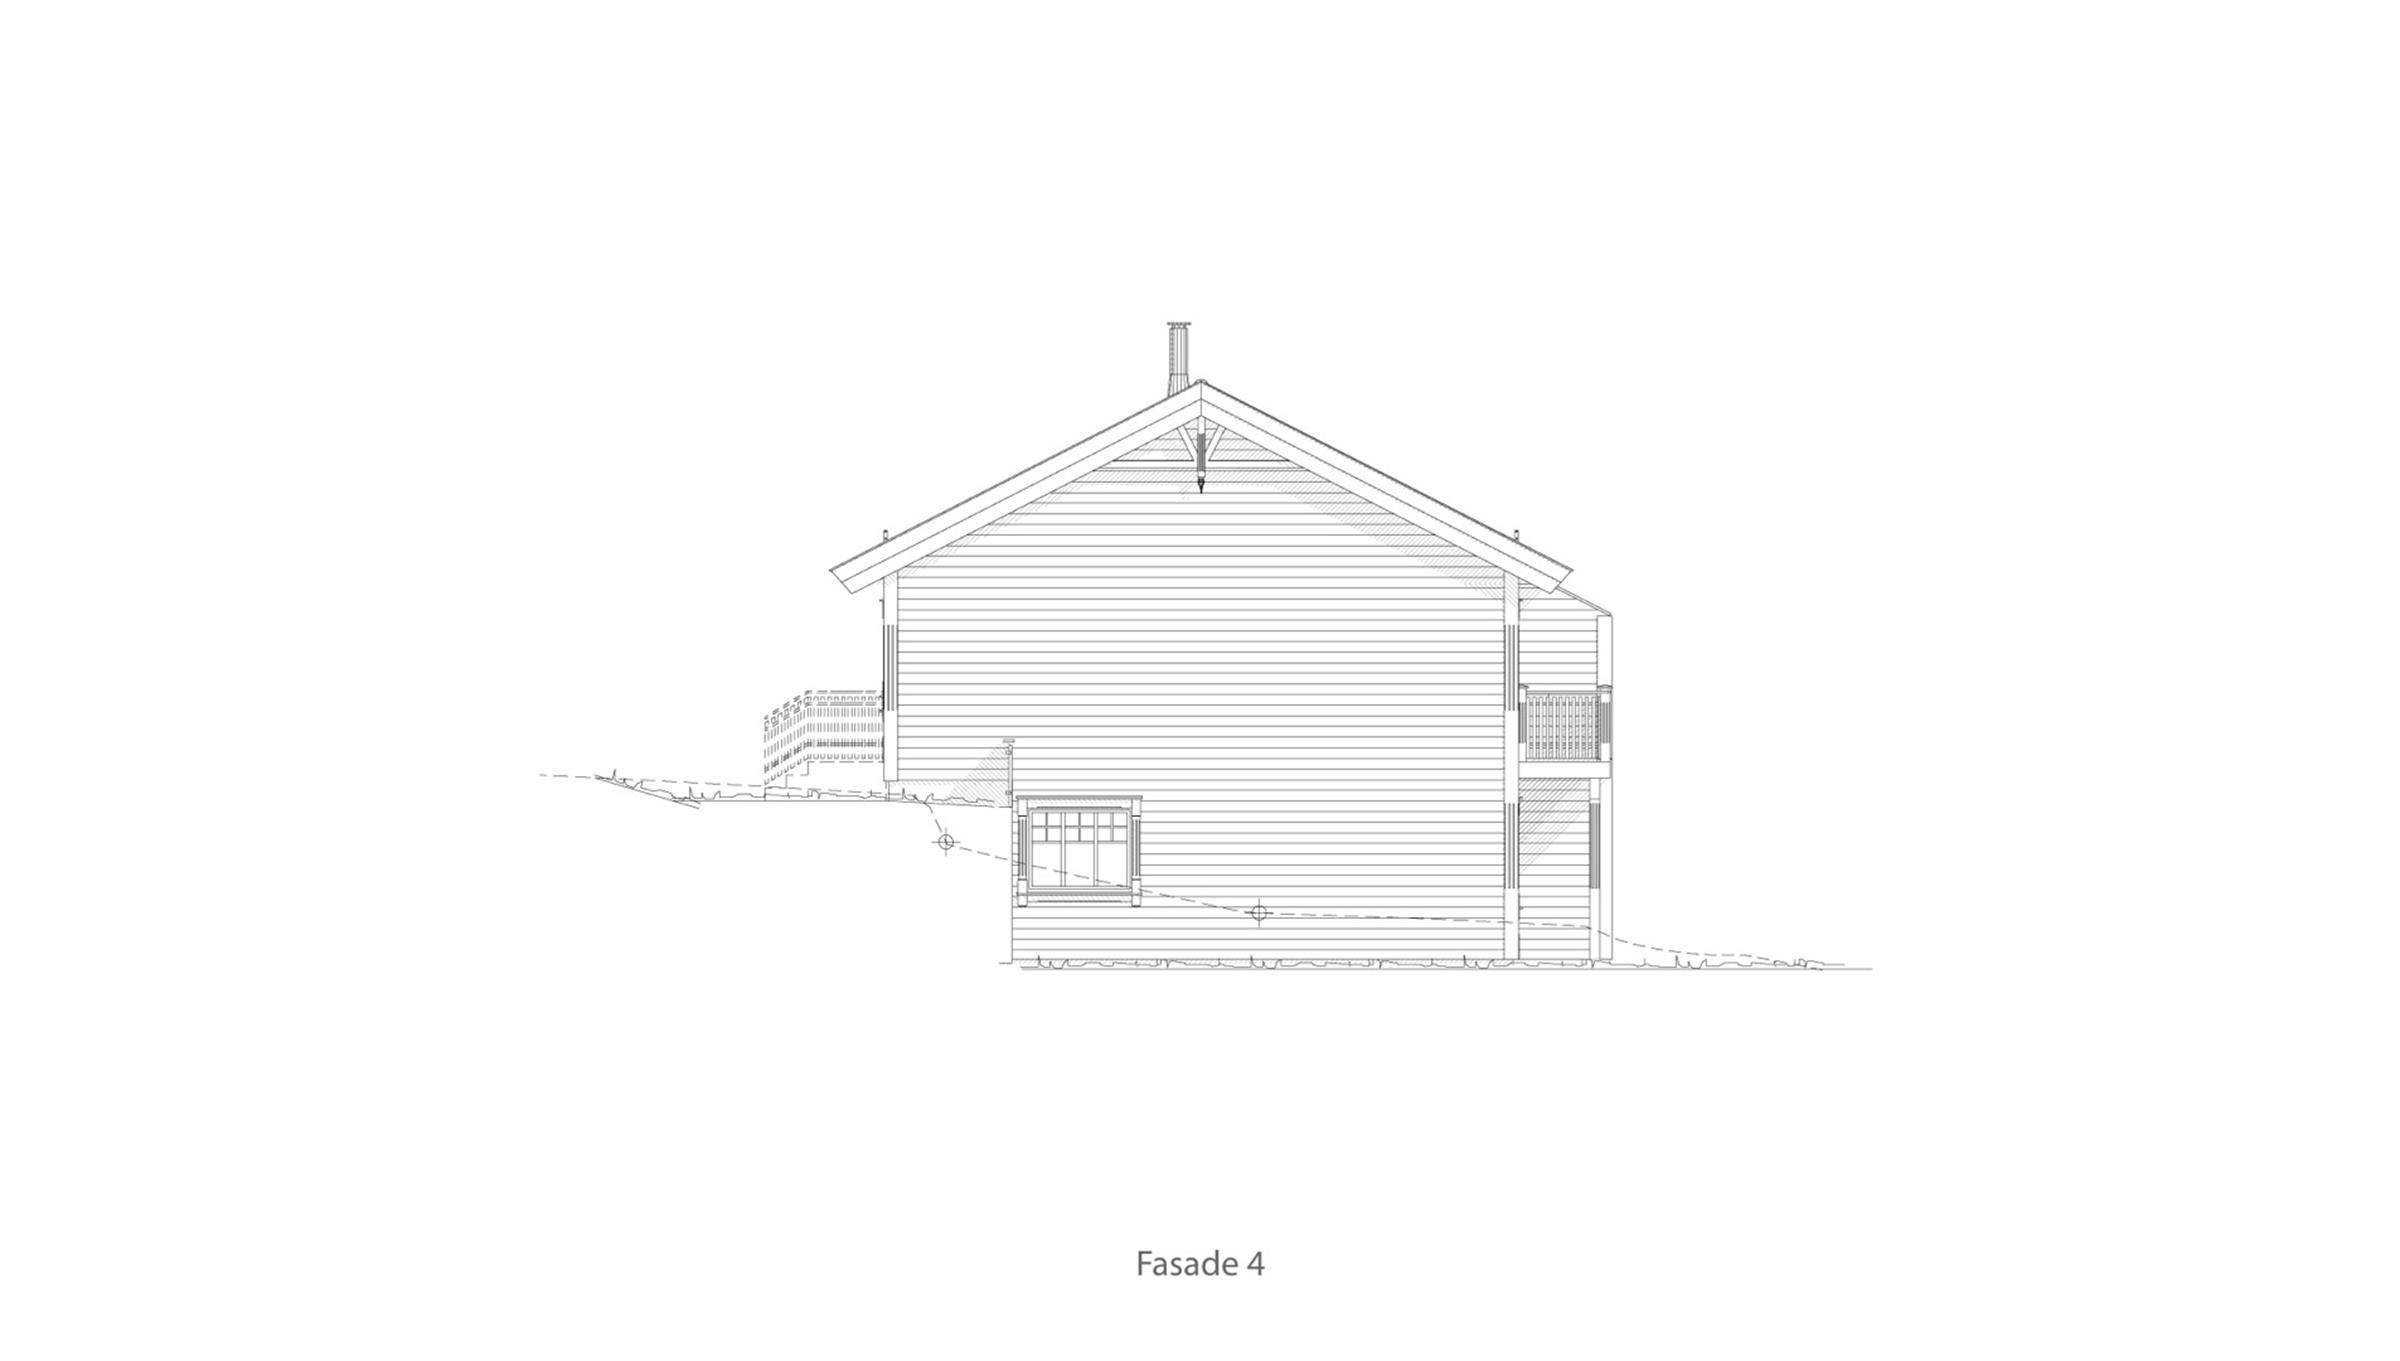 Alta fasade 4